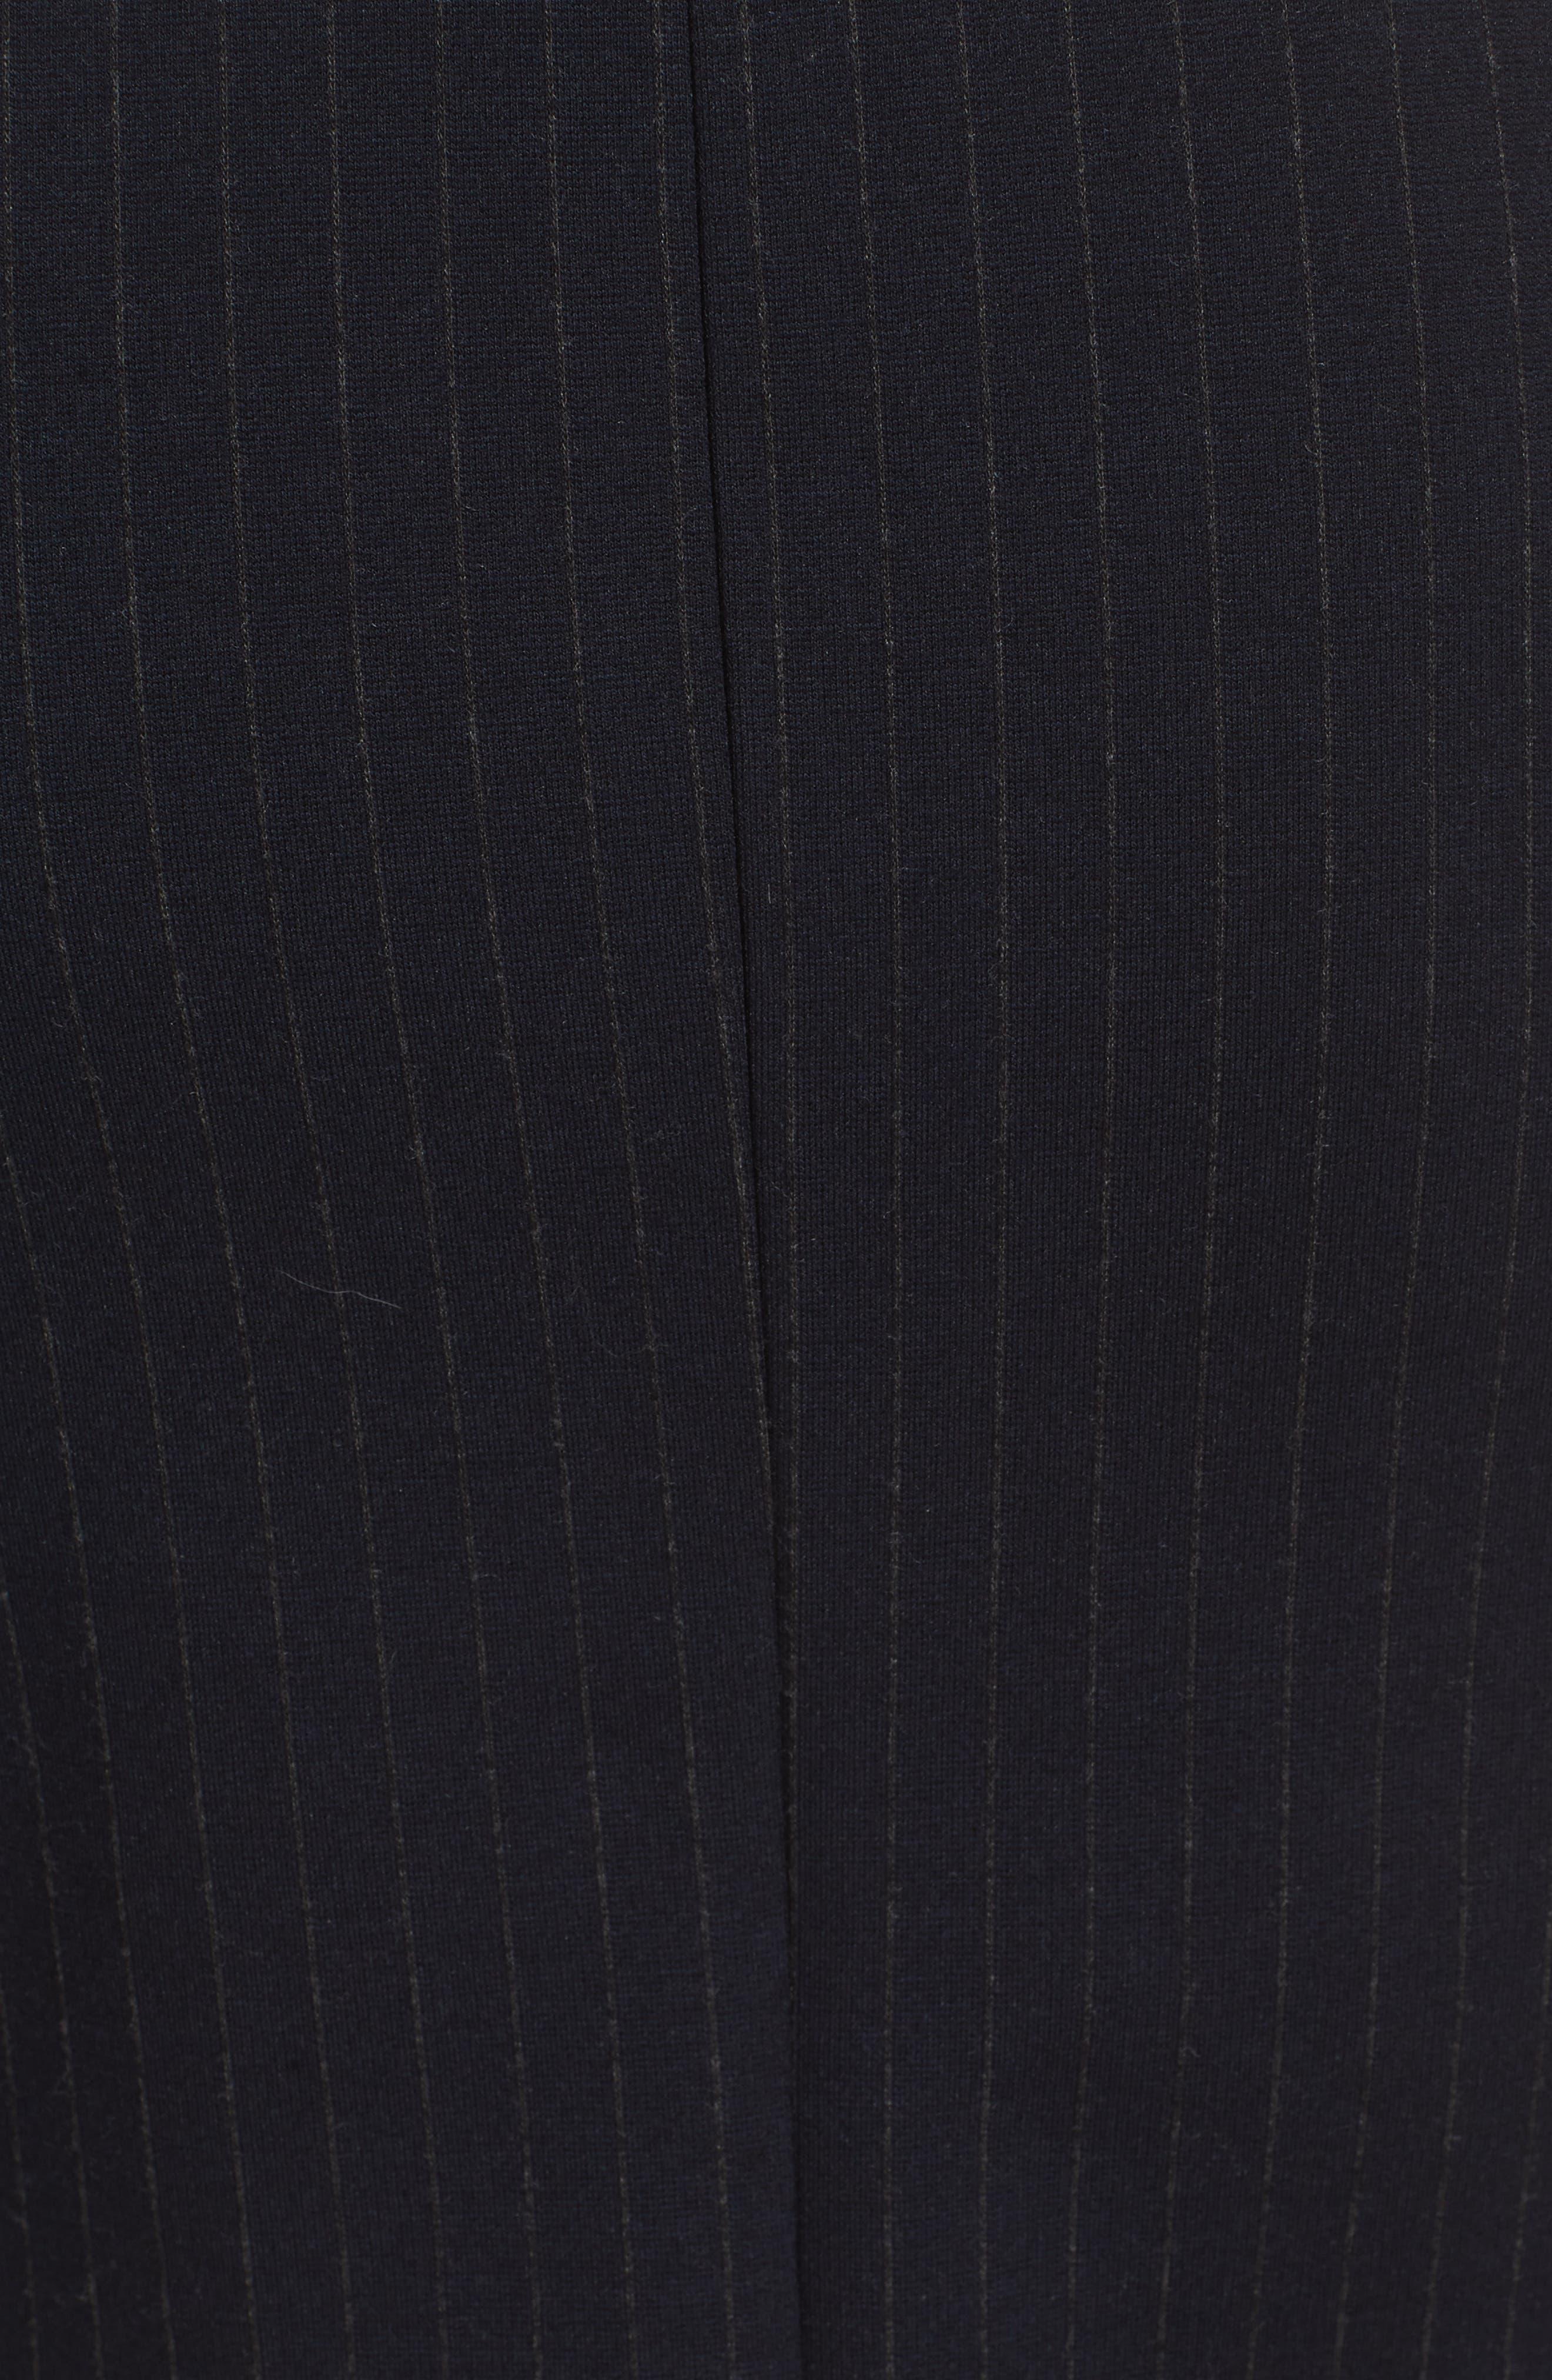 Pinstripe A-Line Dress,                             Alternate thumbnail 5, color,                             DEEP NAVY